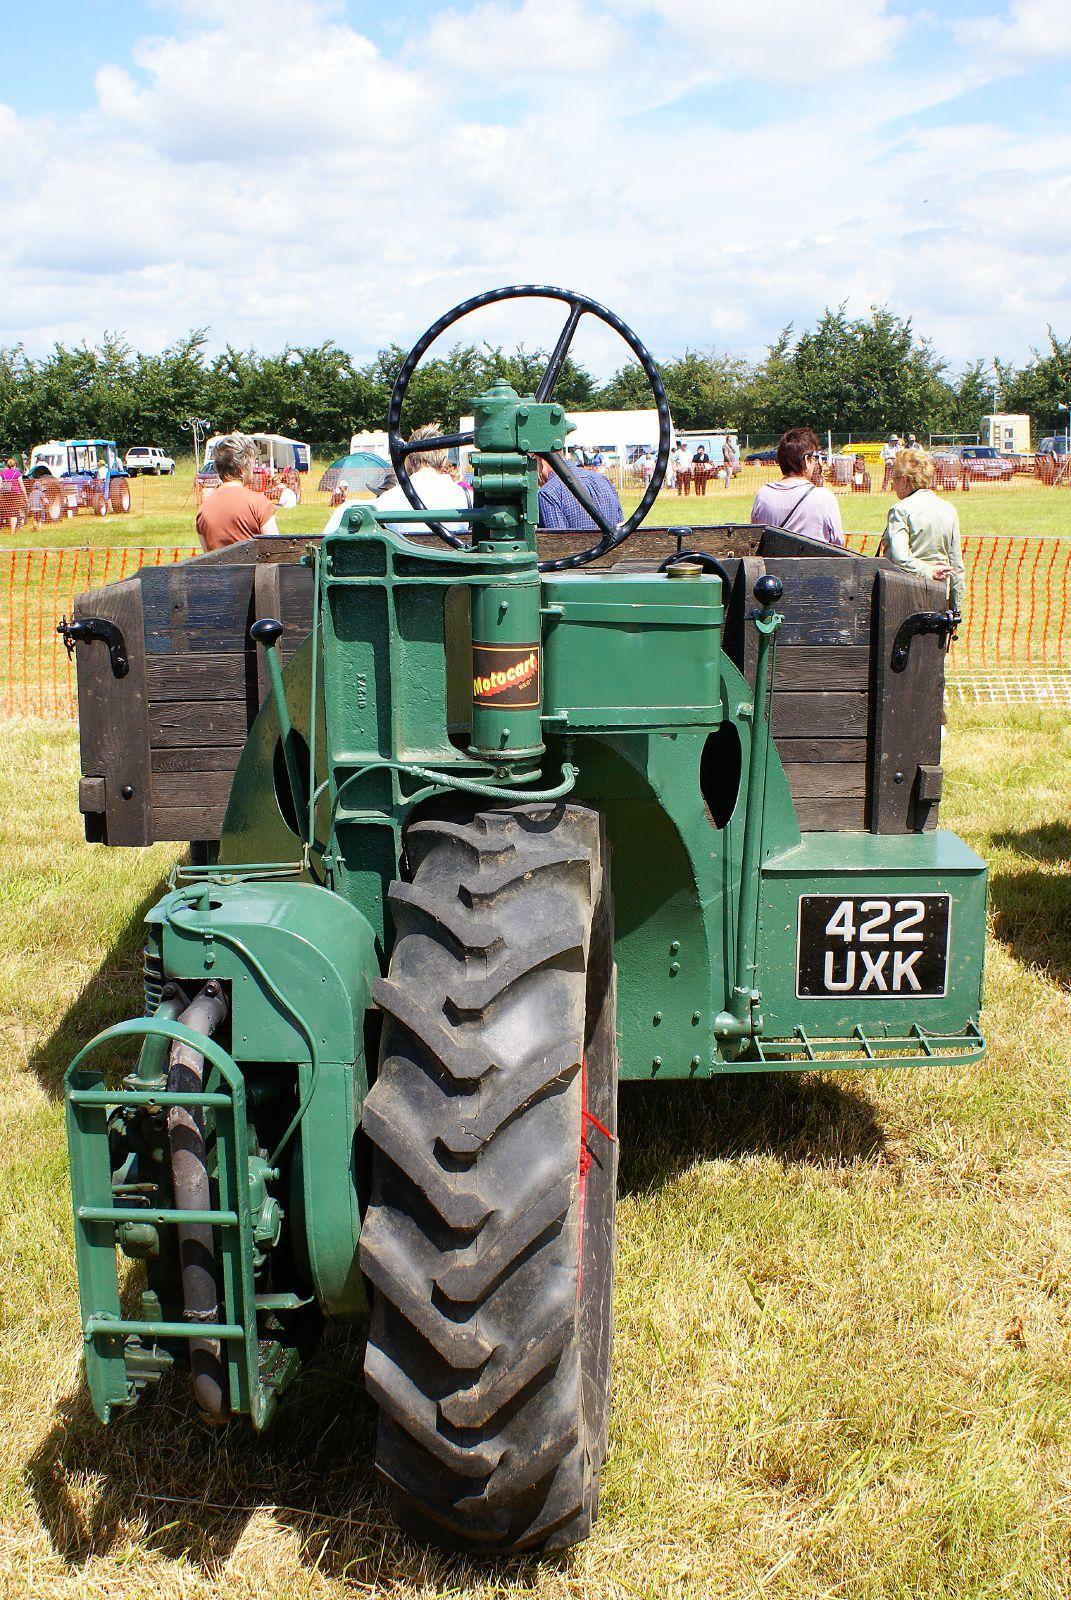 Monowheel tractor - Wikipedia